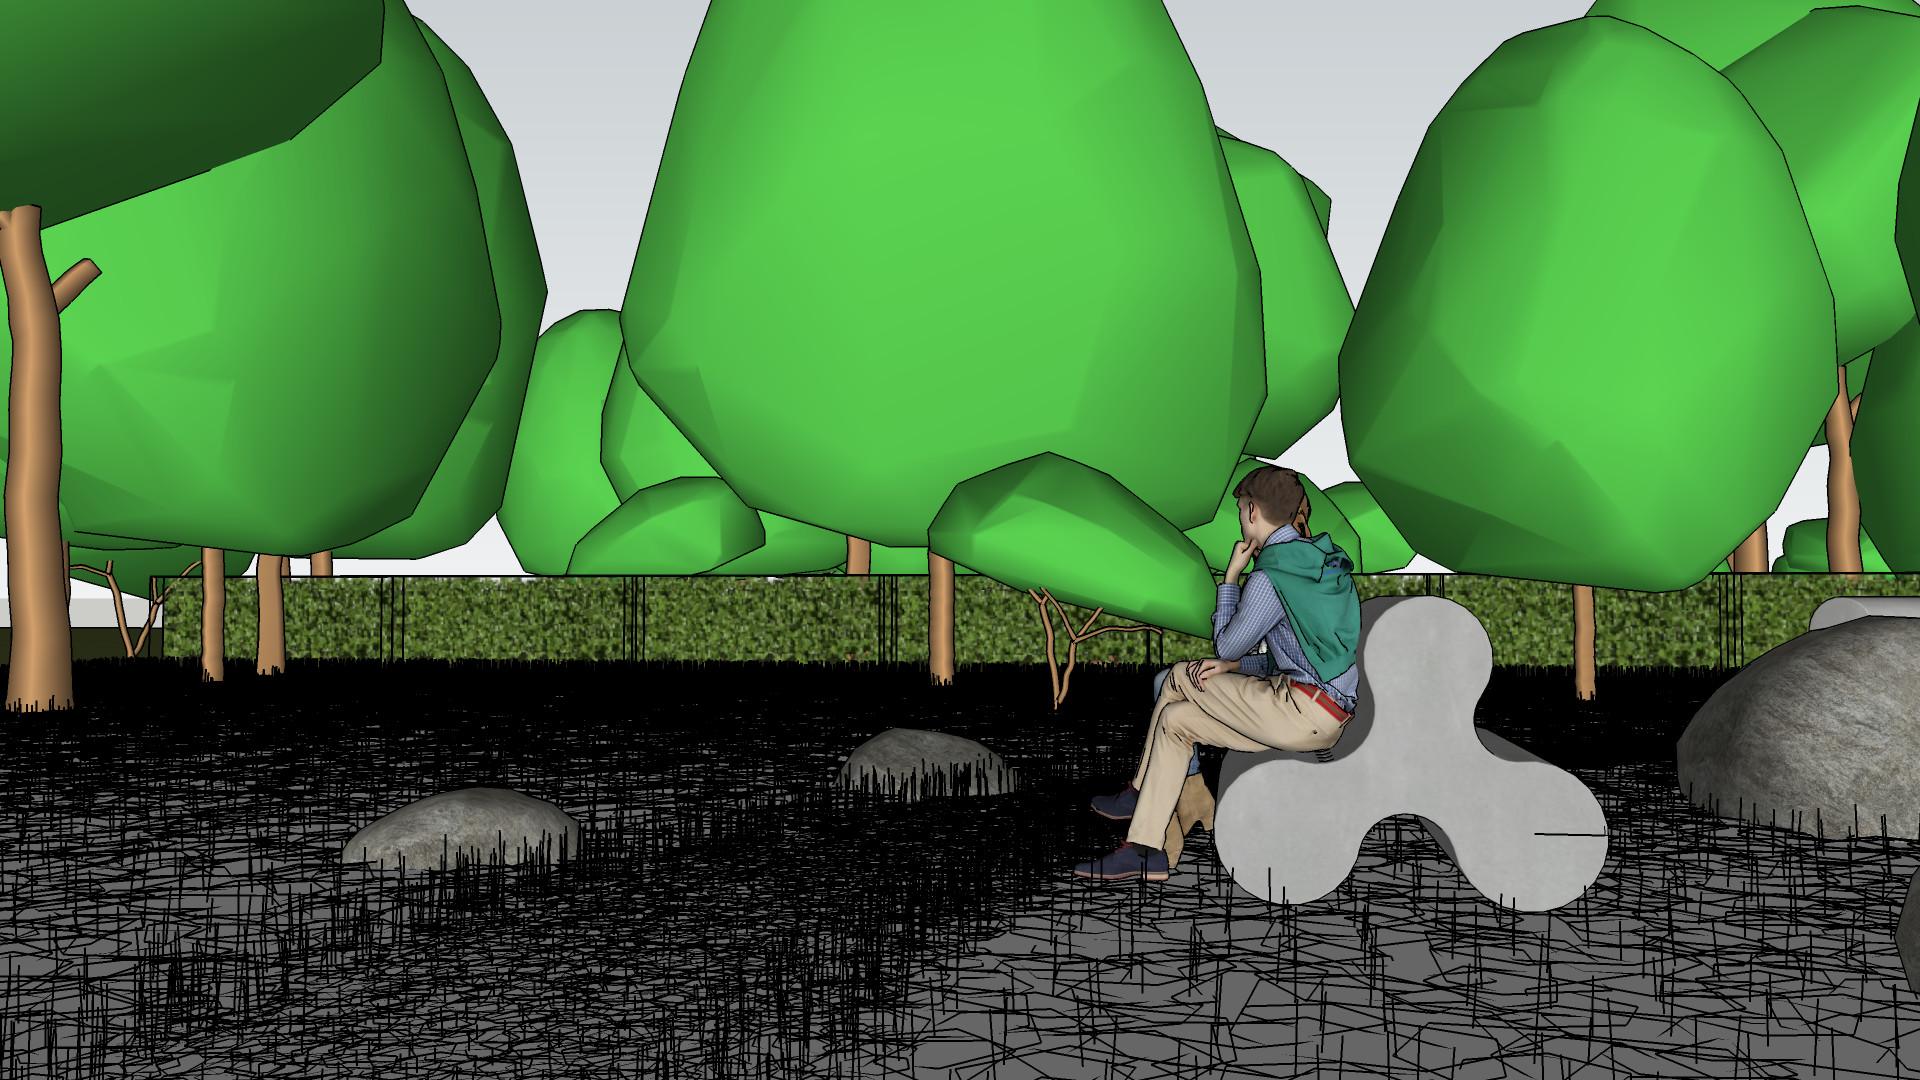 Duane kemp garden furniture for sofi dosa scene 6 su